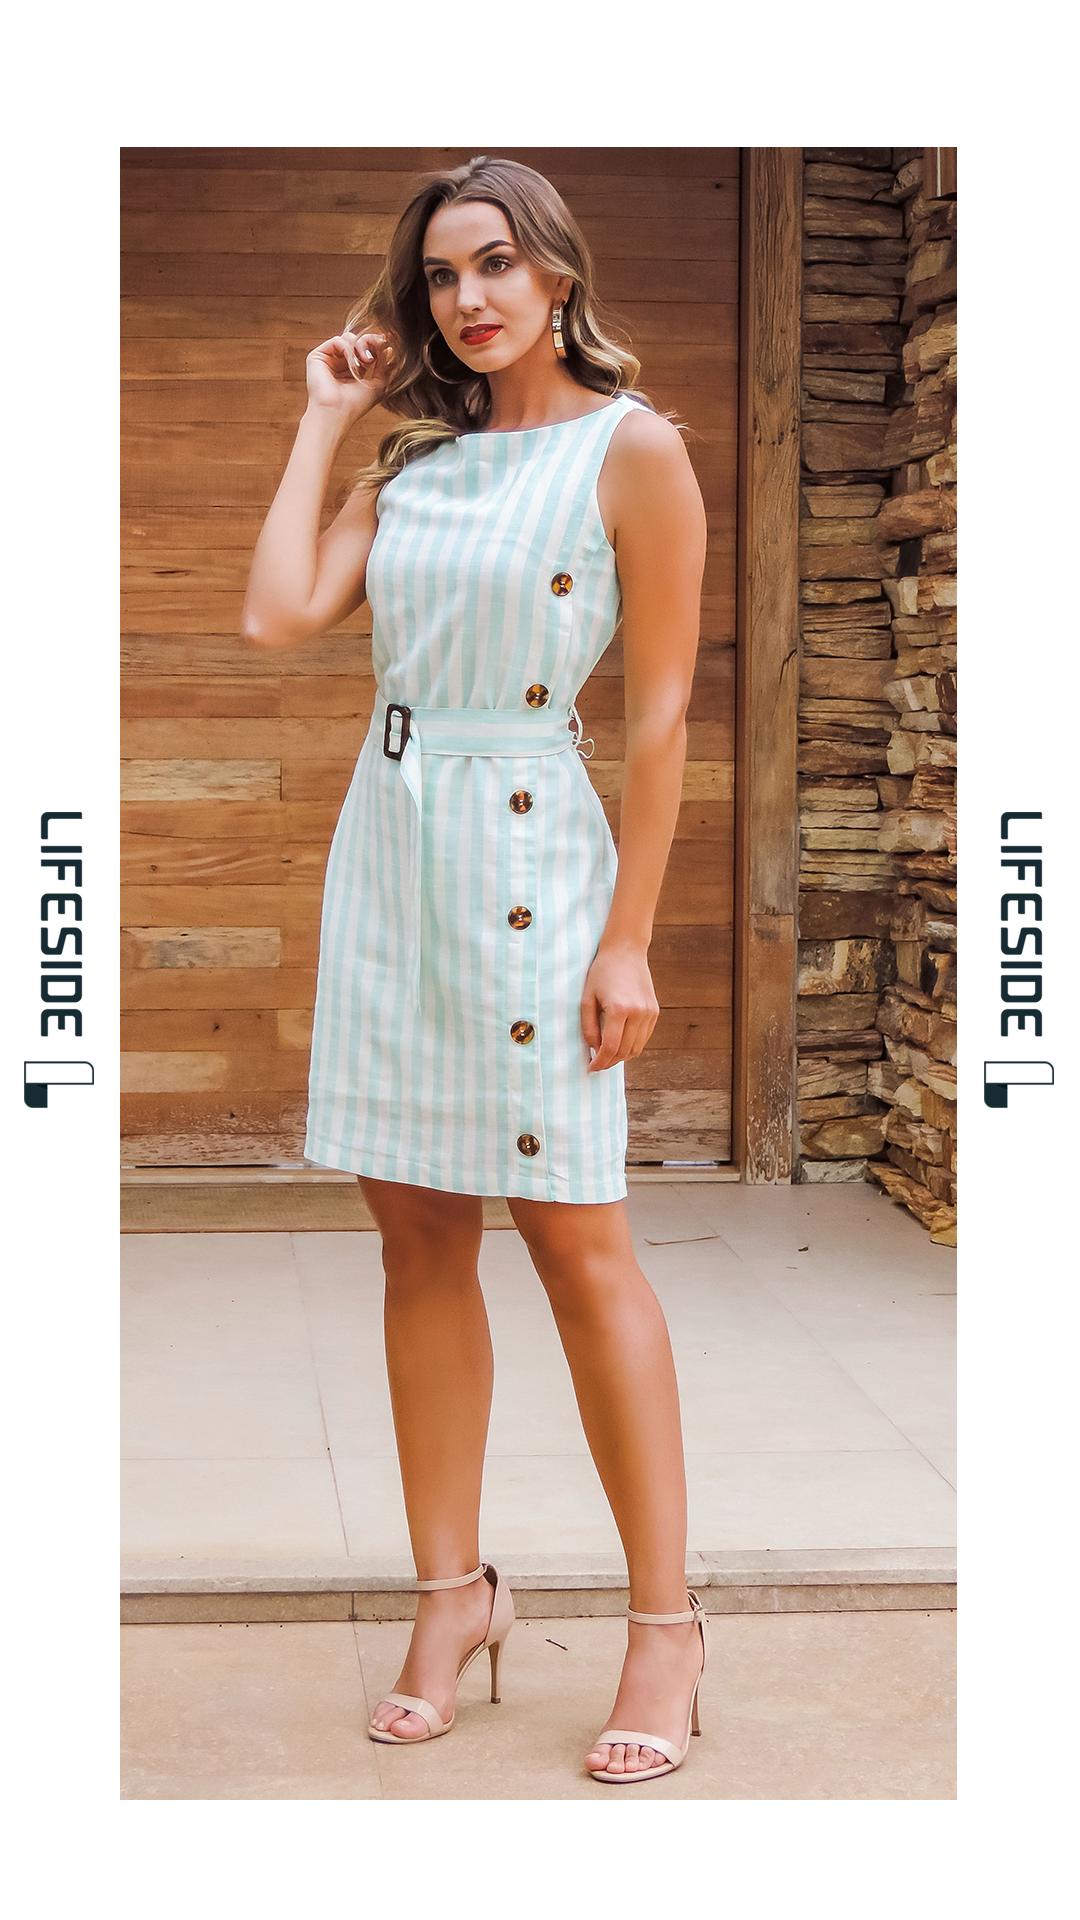 94c2b4dd6f18eb LIFESIDE | Moda Feminina Primavera 2019. Vestido em linho listrado ...